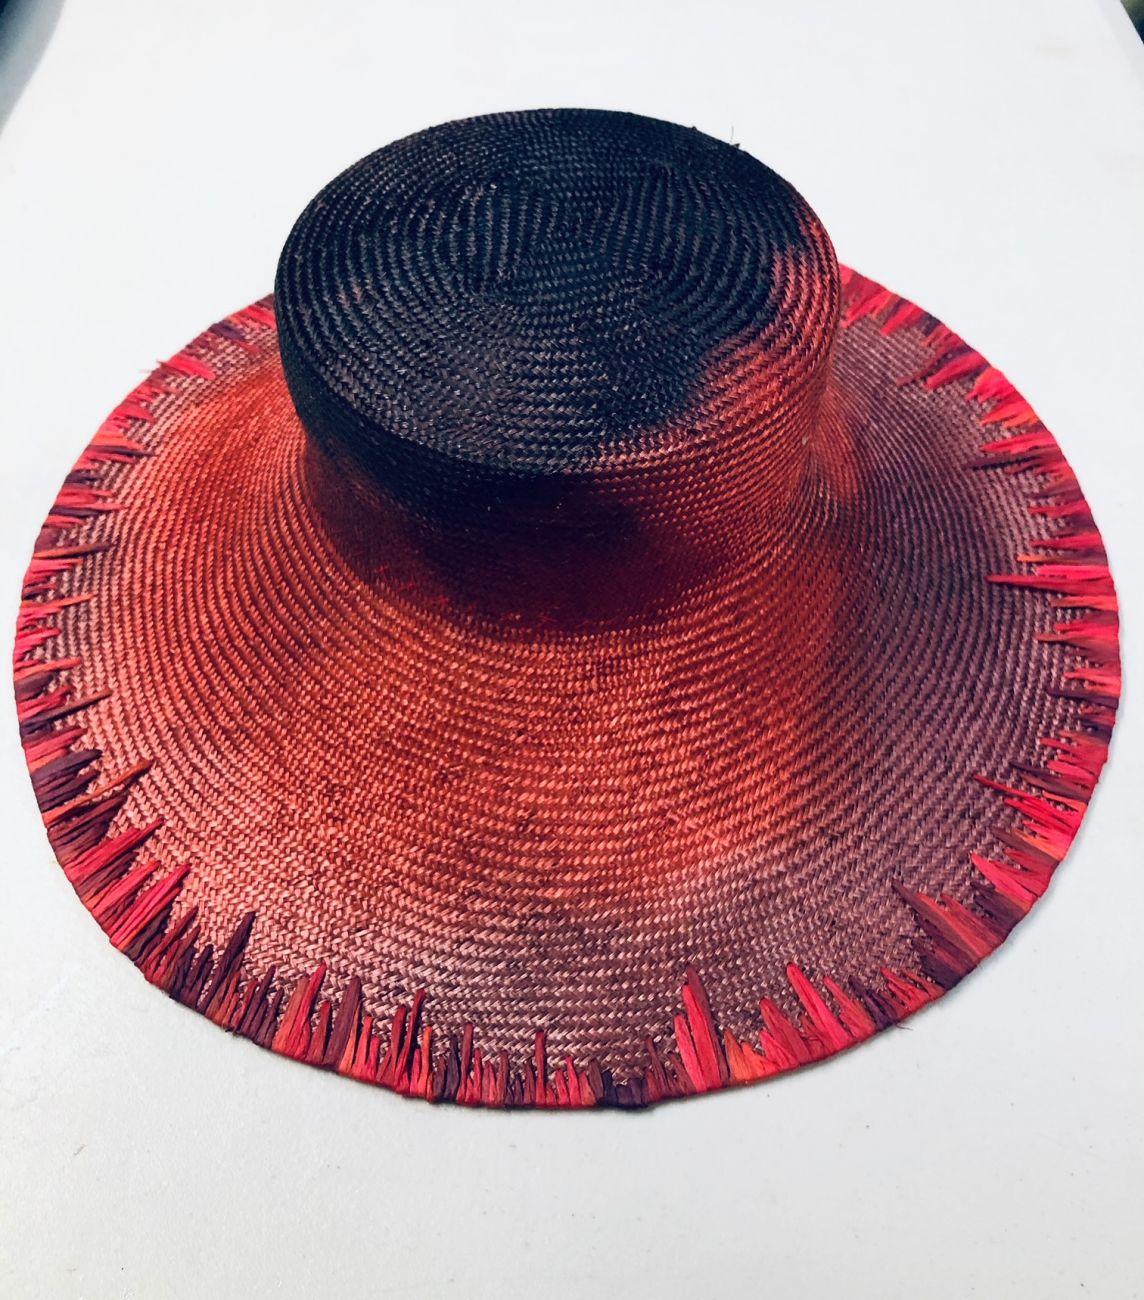 Aurburn and navy hat by Waltraud Reiner